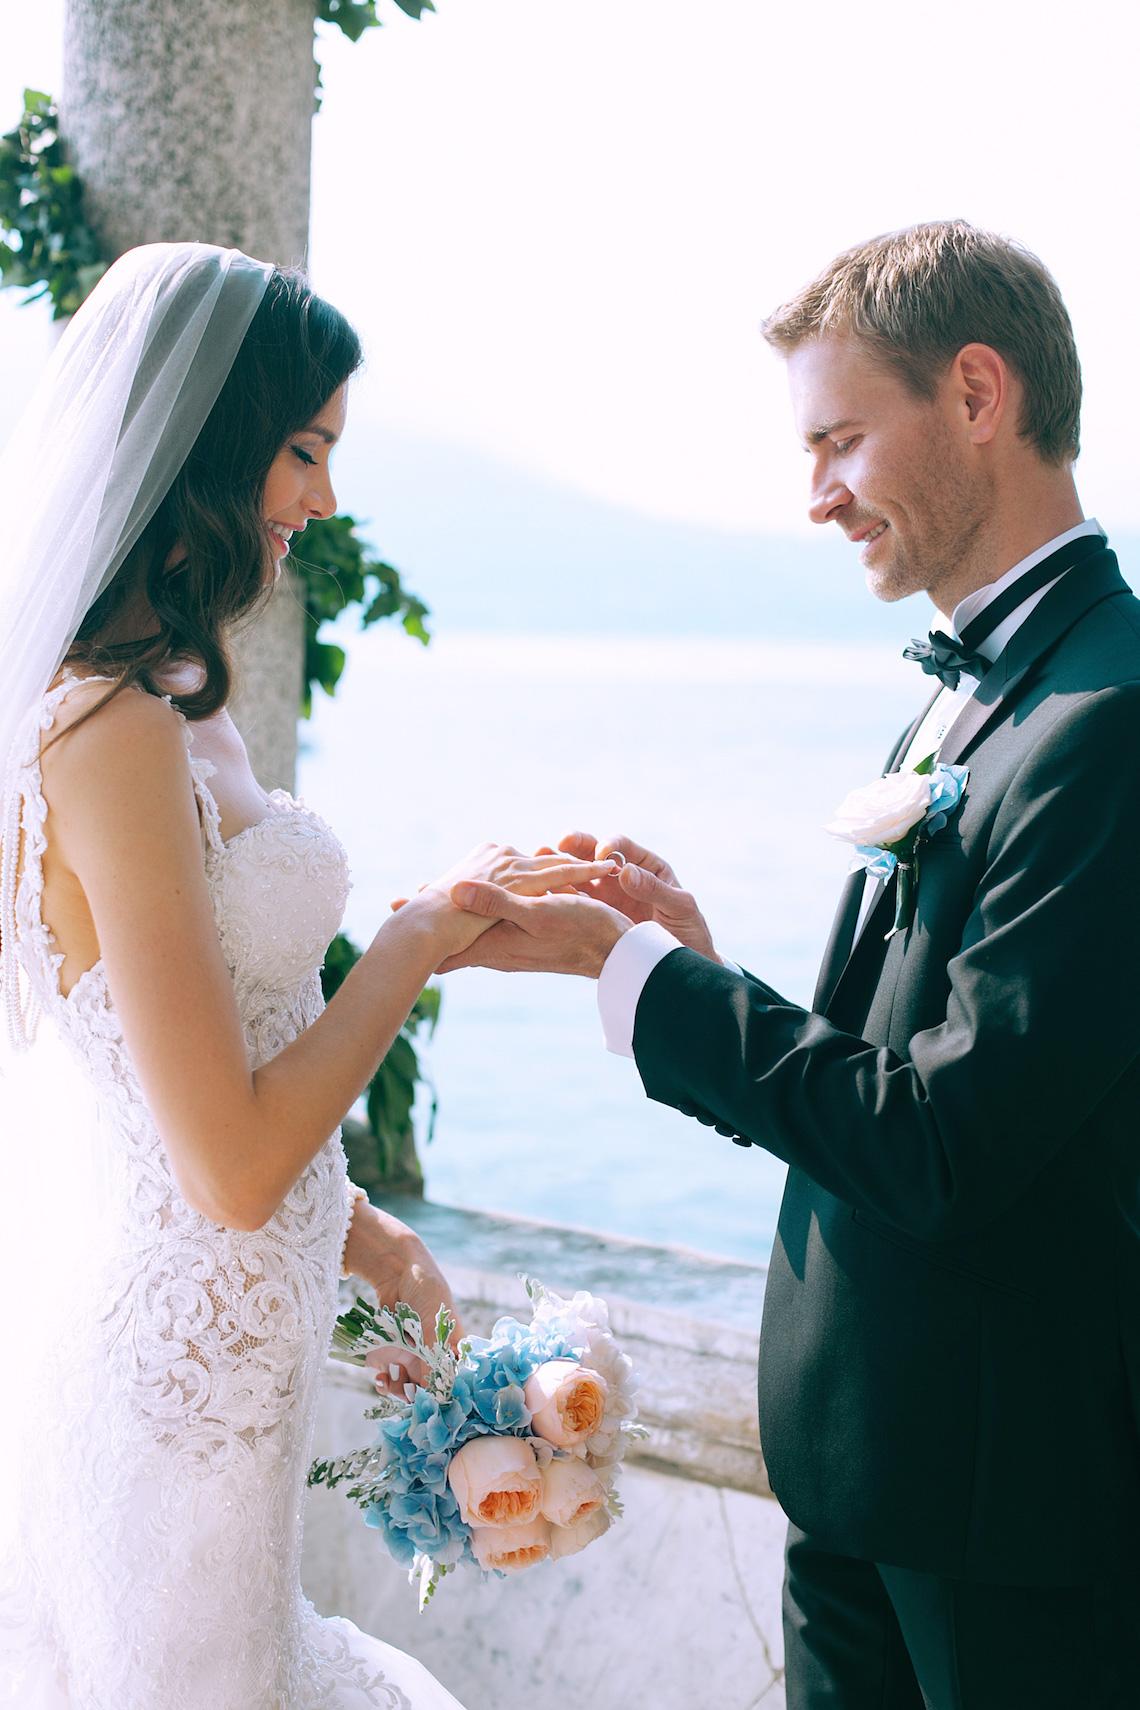 Destination-Wedding-in-Lake-Como-by-Orlova-Maria-and-WeddItaly-39